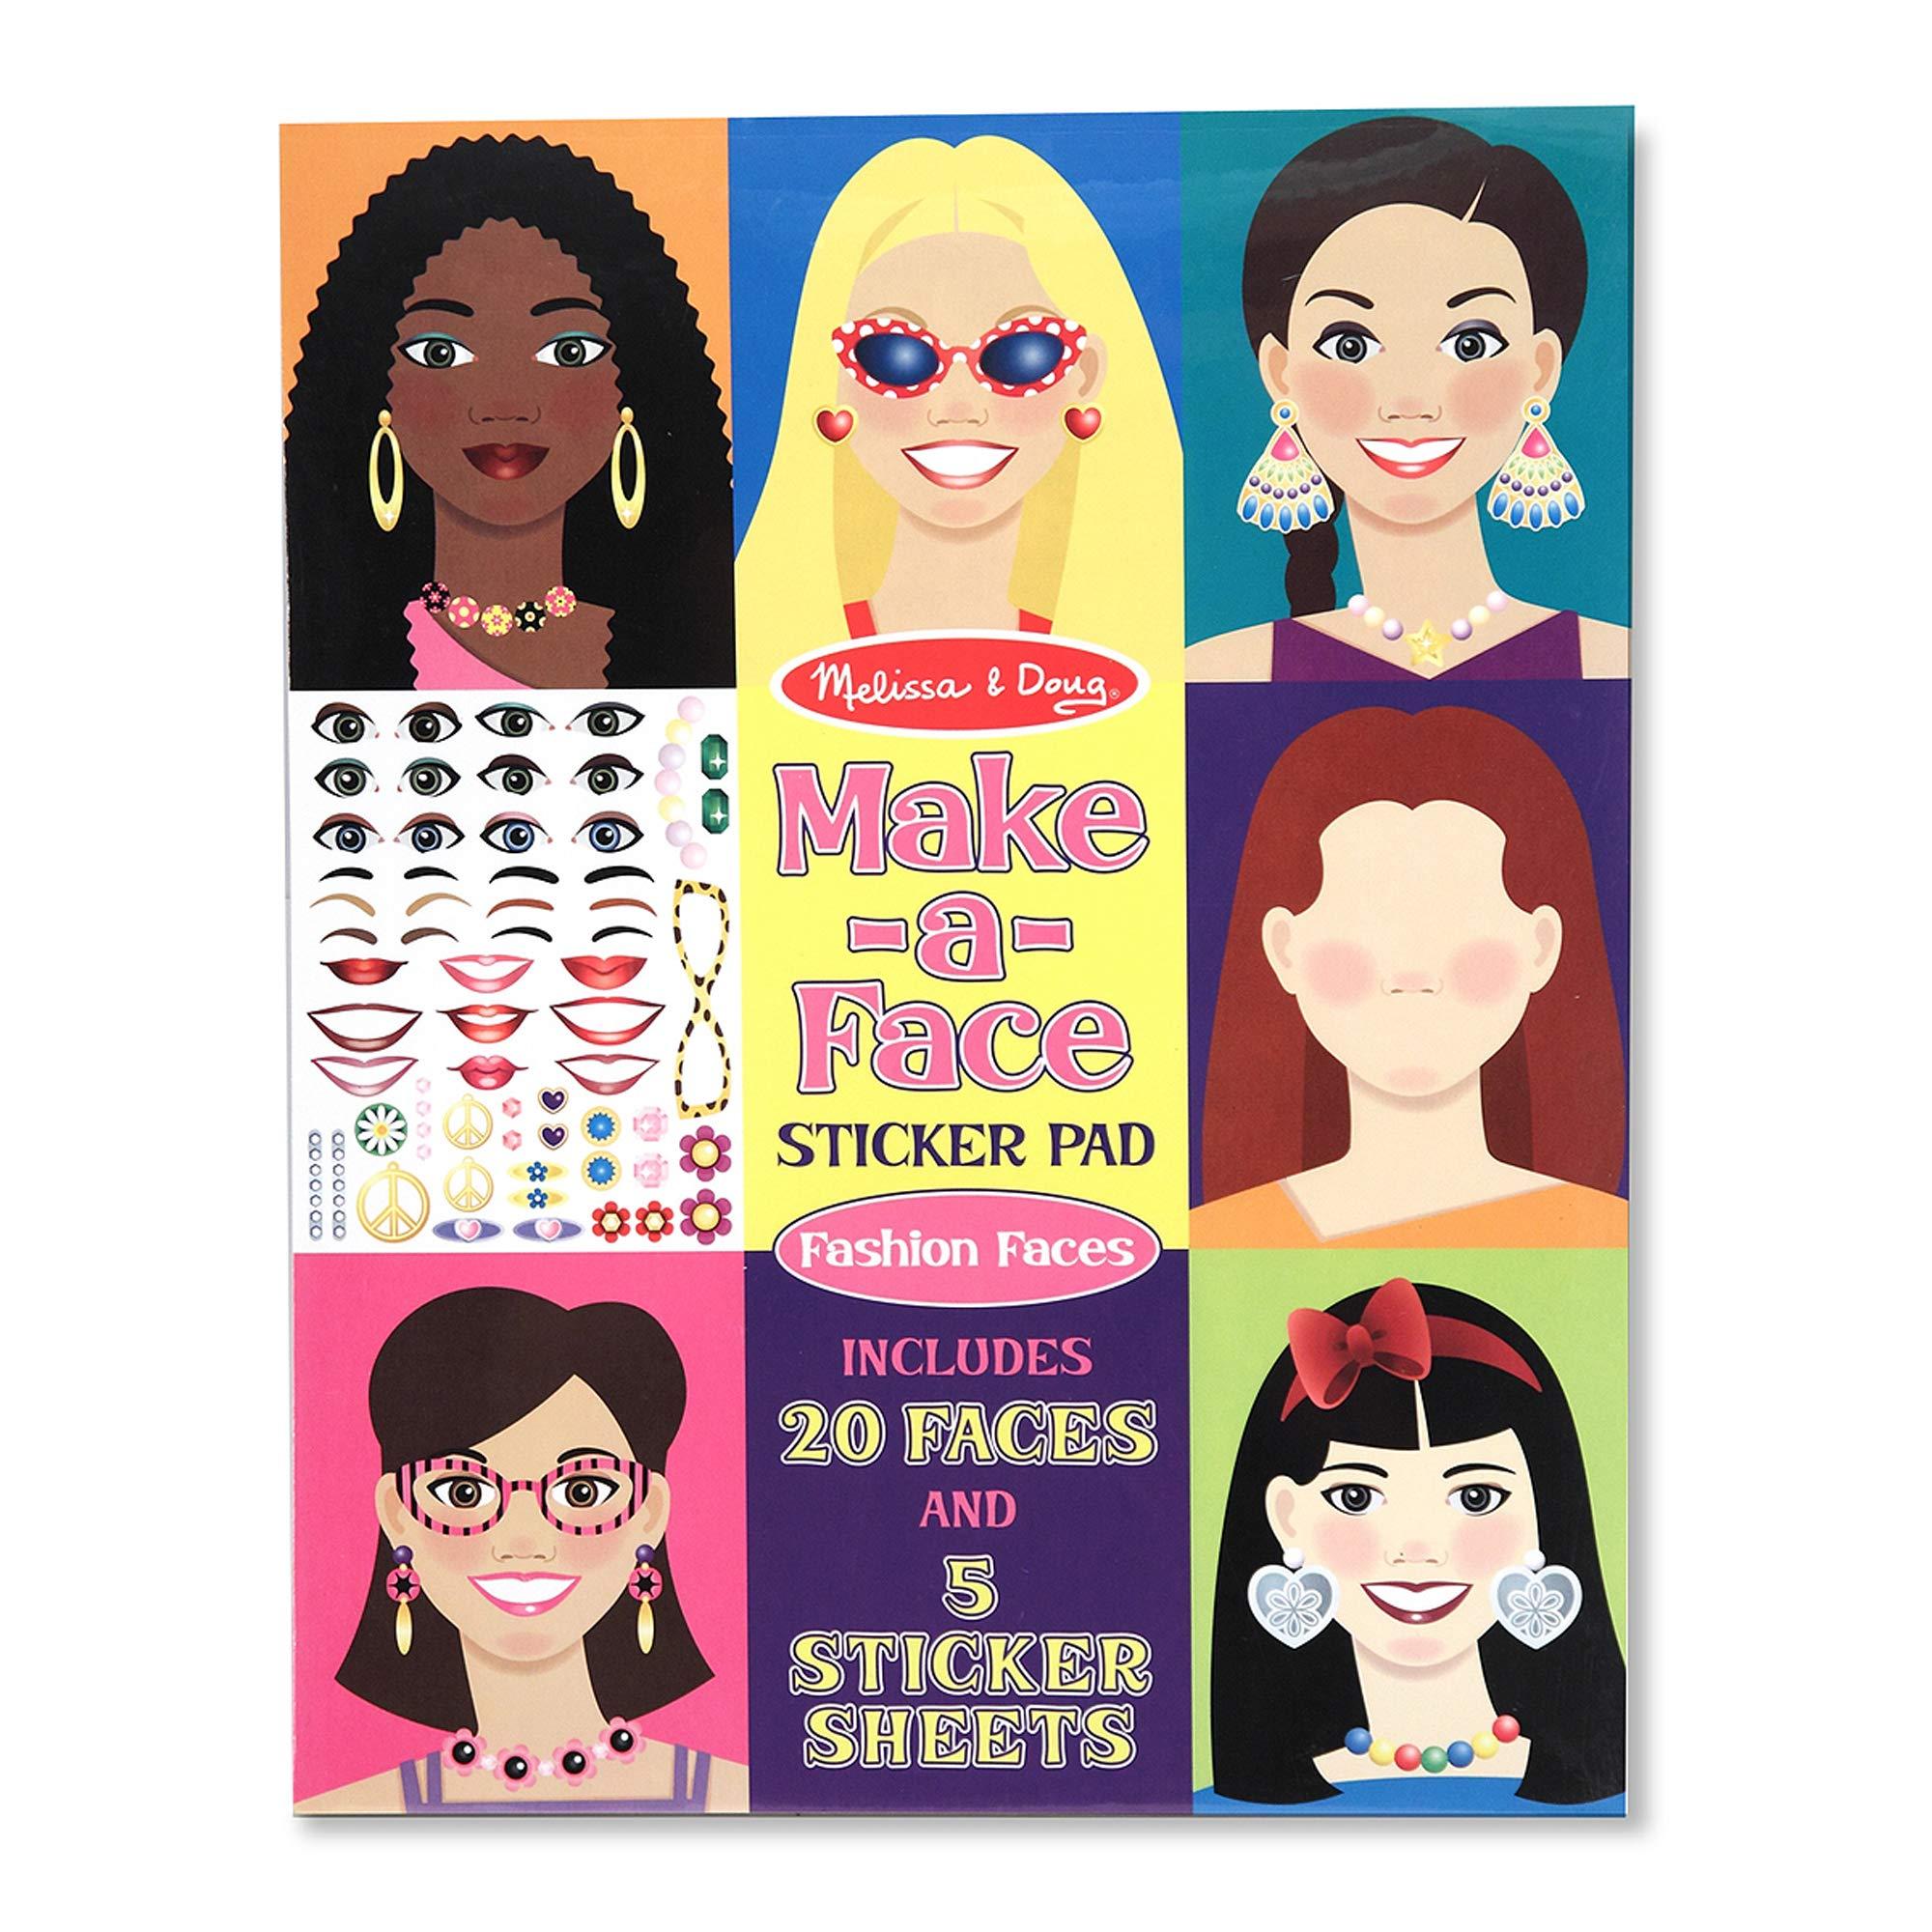 Melissa & Doug Make-a-Face Sticker Pad - Fashion Faces